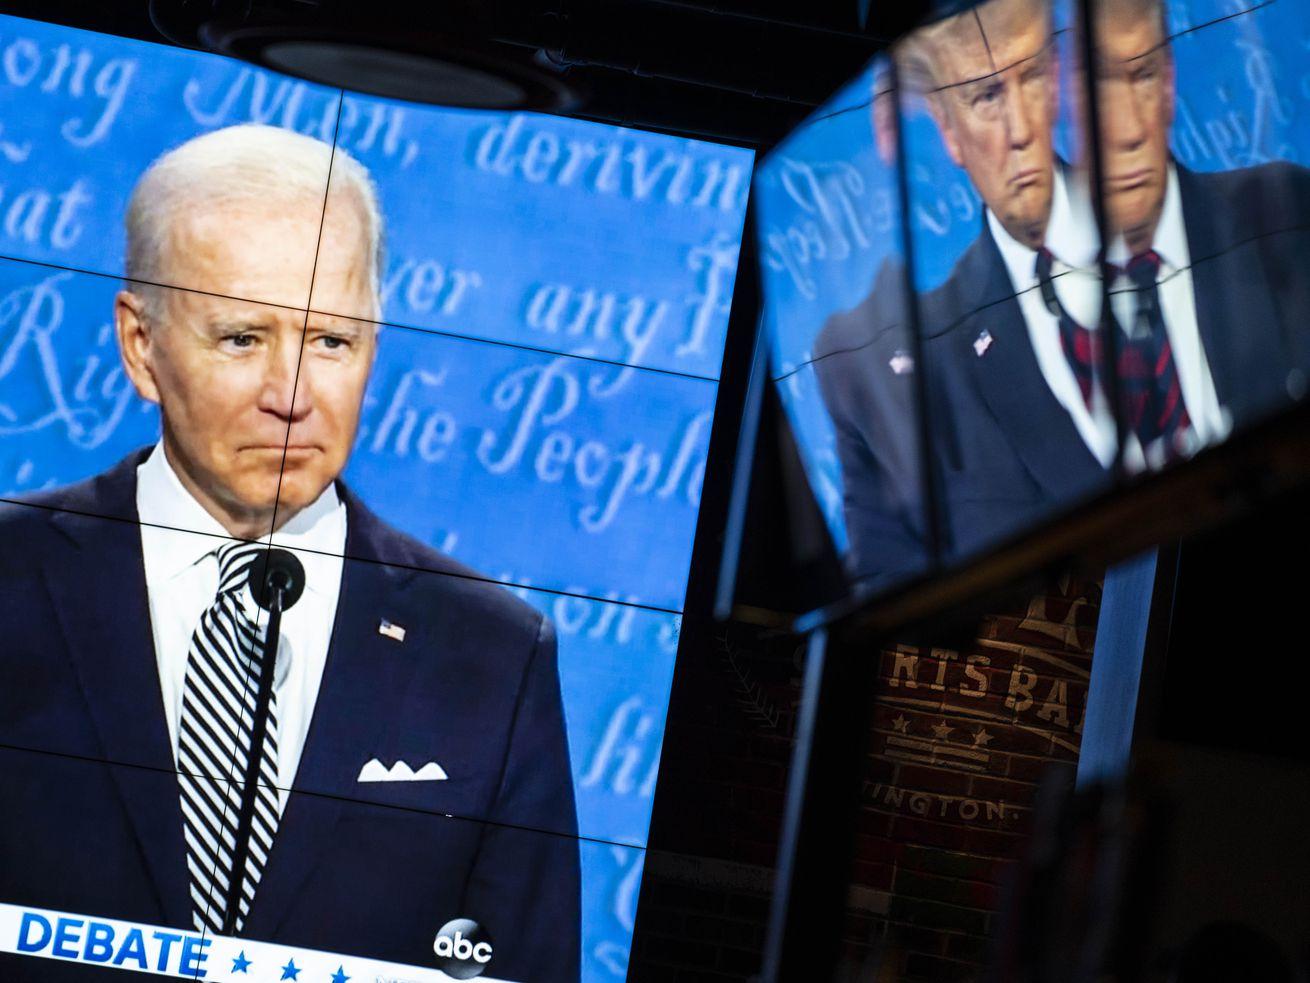 Biden and Trump at the debate on screens.